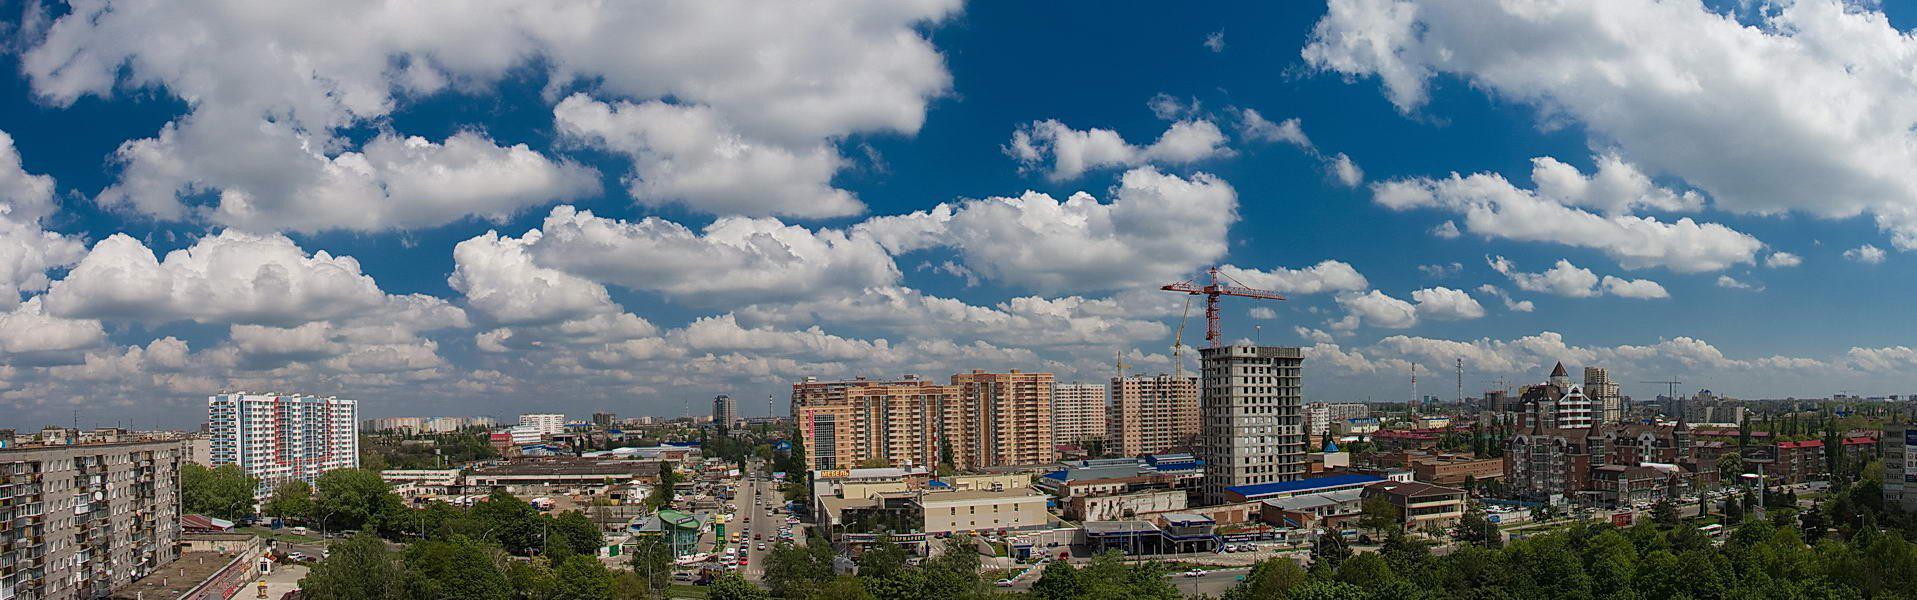 Наша Великая Победа: Краснодар, 22.03.2015